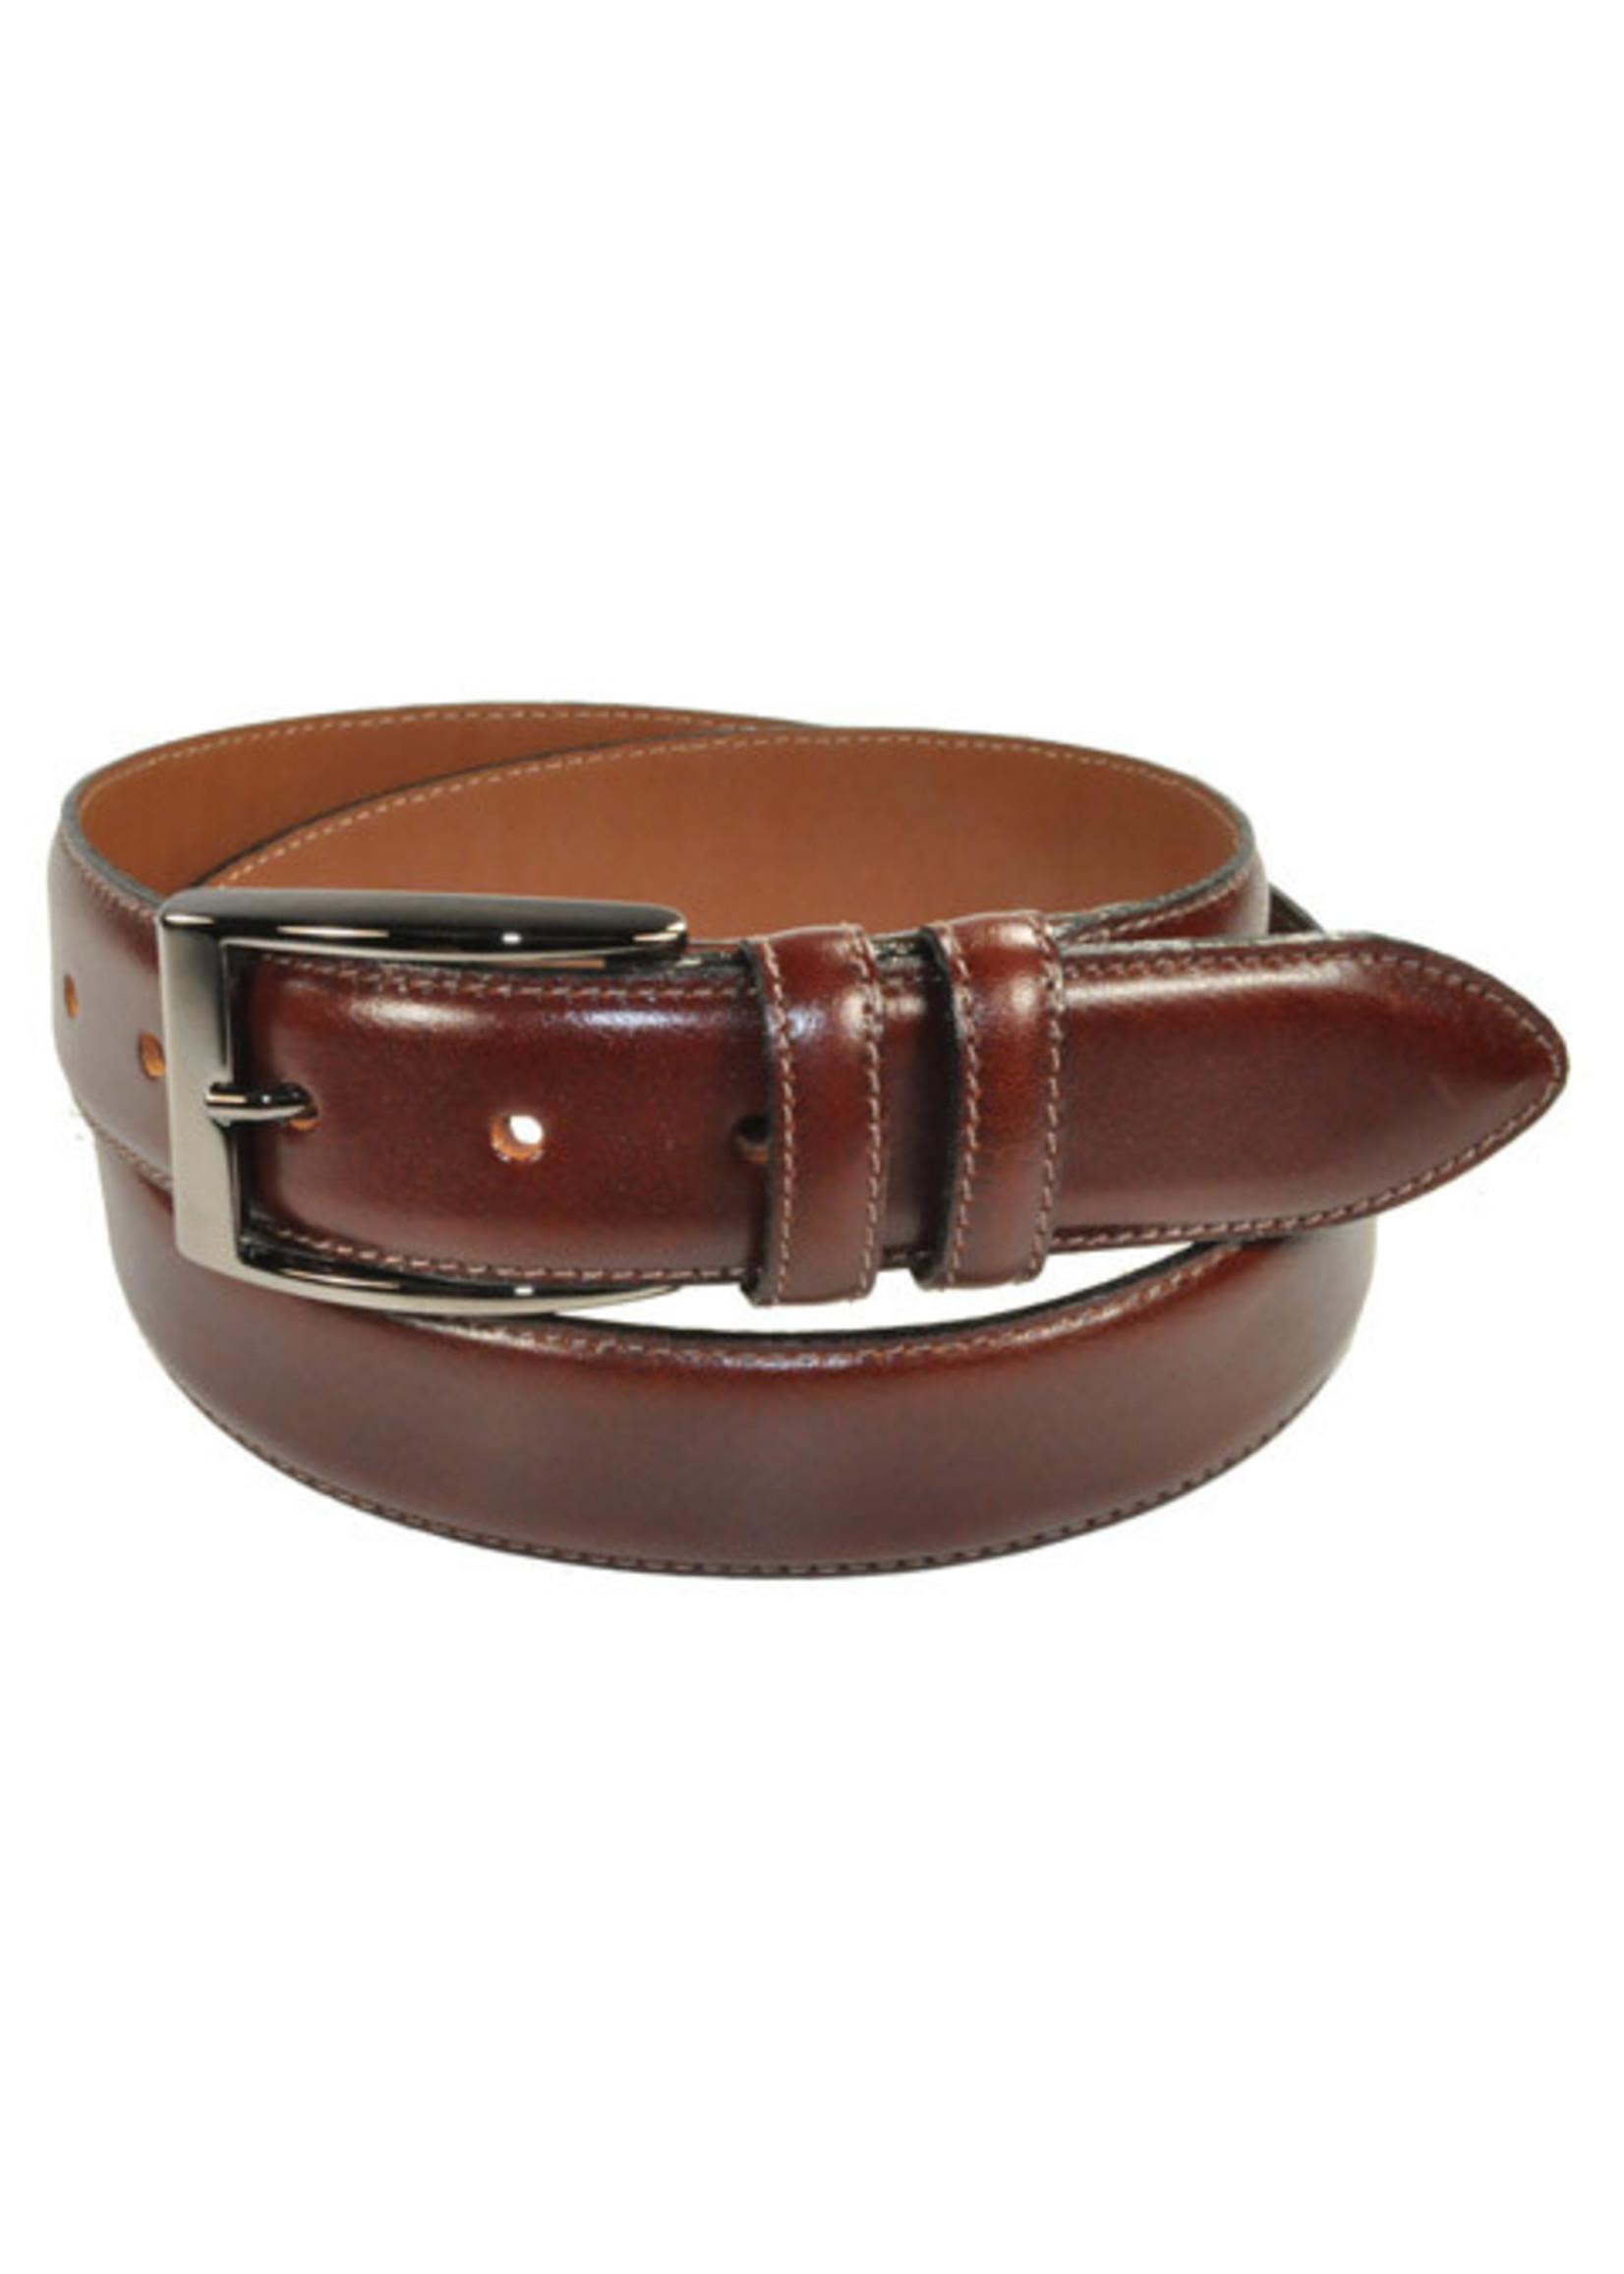 Bench Craft Leather Bench Craft's Genuine Leather Dress  Belt